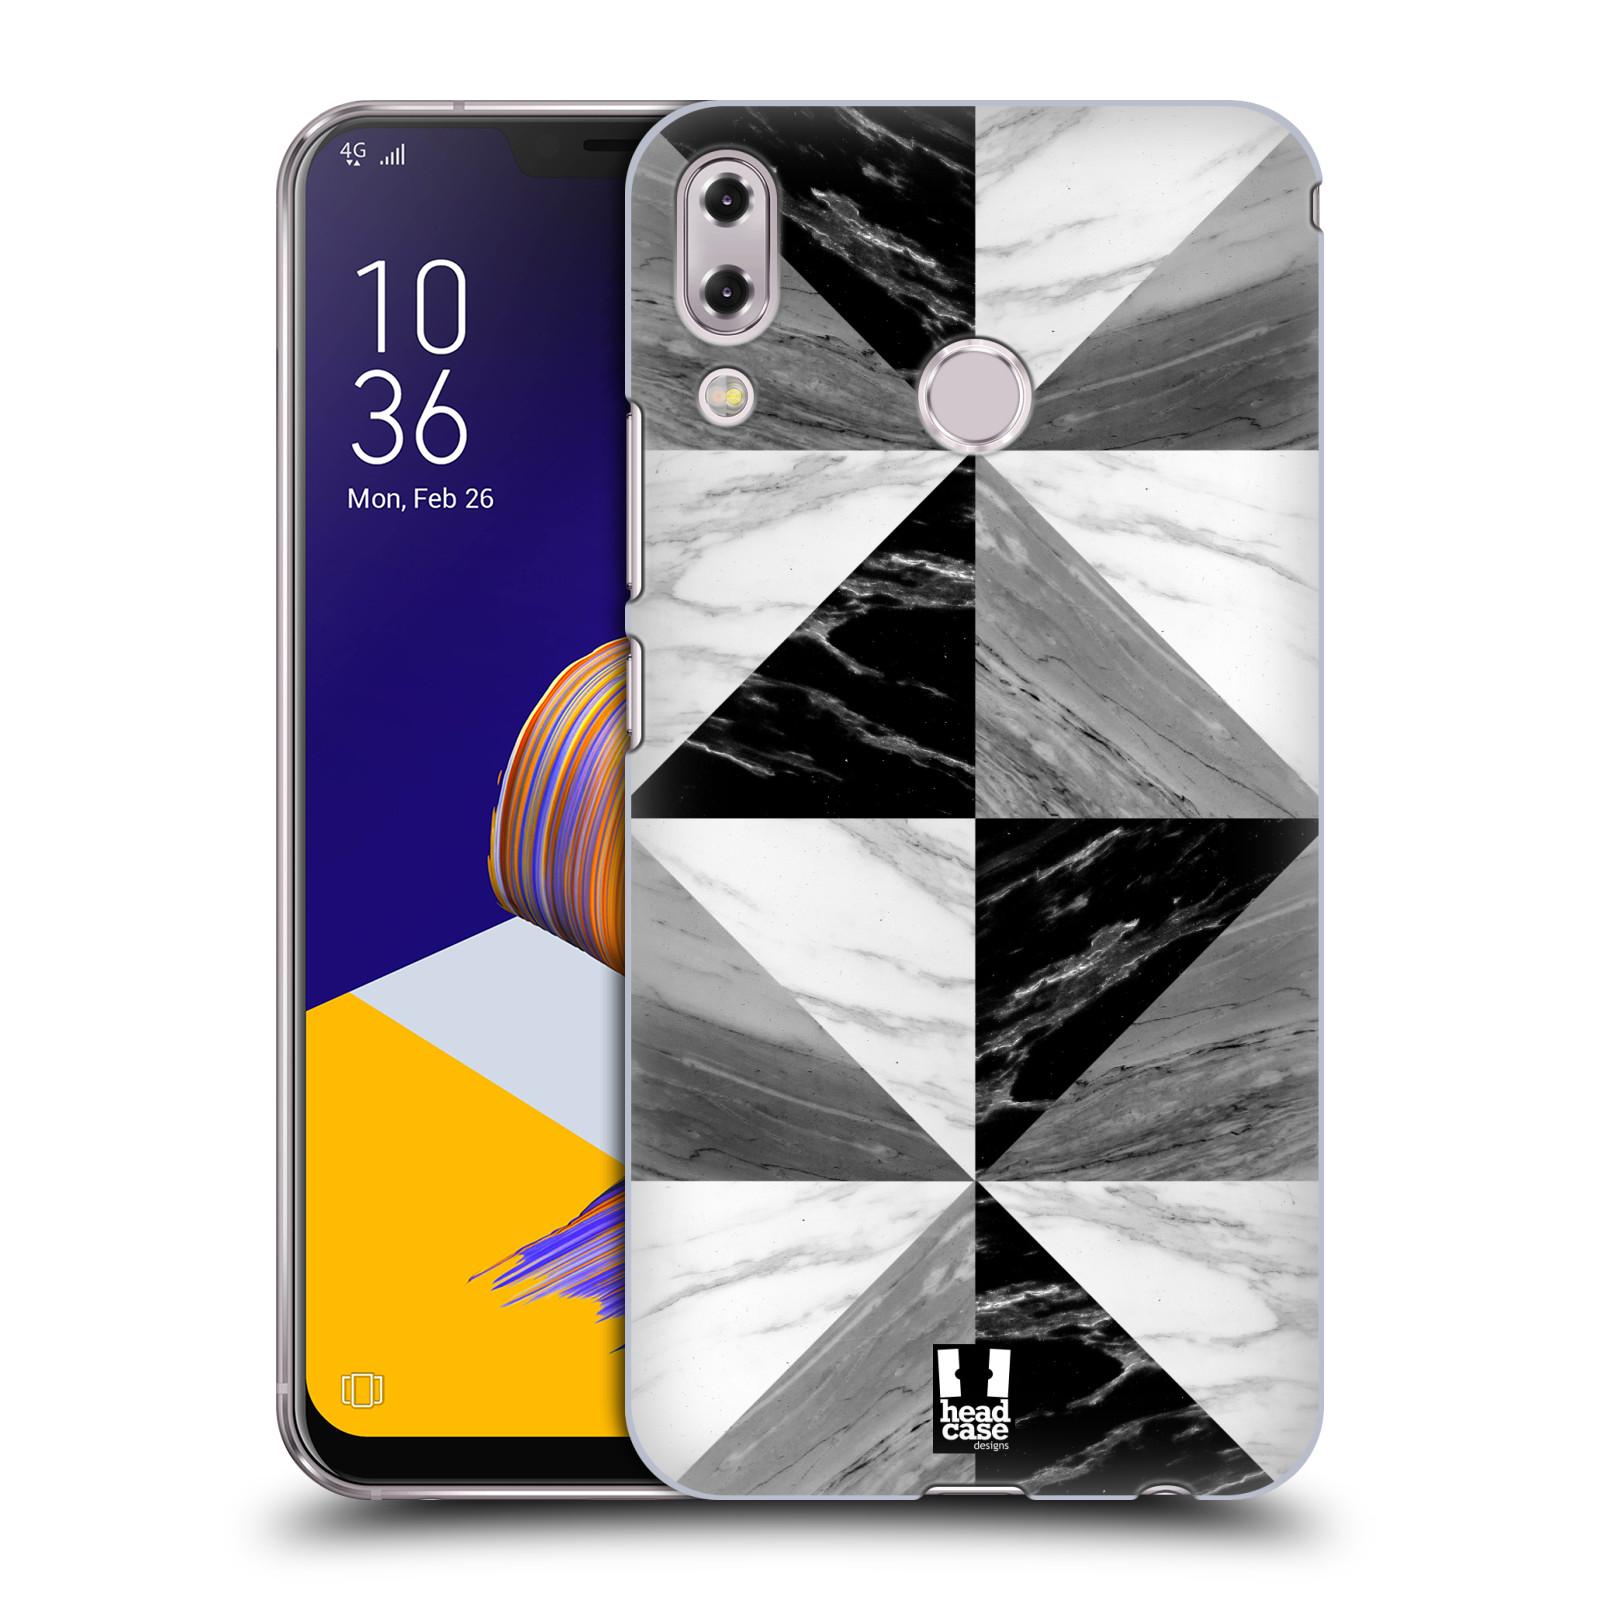 Plastové pouzdro na mobil Asus Zenfone 5z ZS620KL - Head Case - Mramor triangl (Plastový kryt či obal na mobilní telefon Asus Zenfone 5z (ZS620KL) s motivem Mramor triangl)